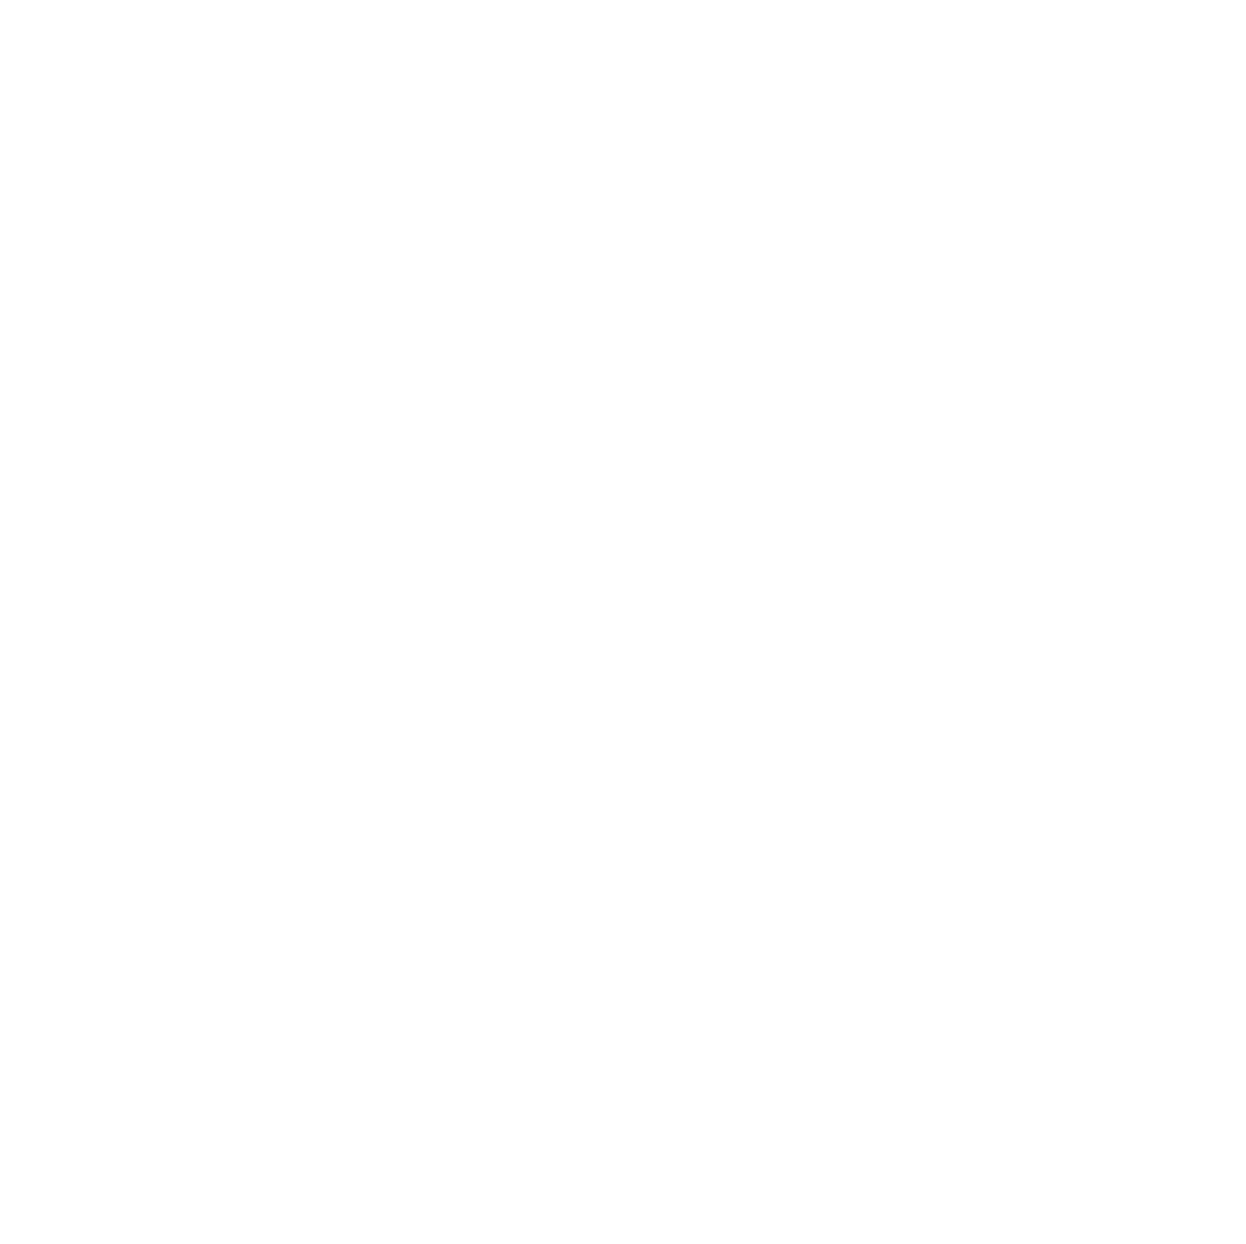 World Diplomacy Fourm